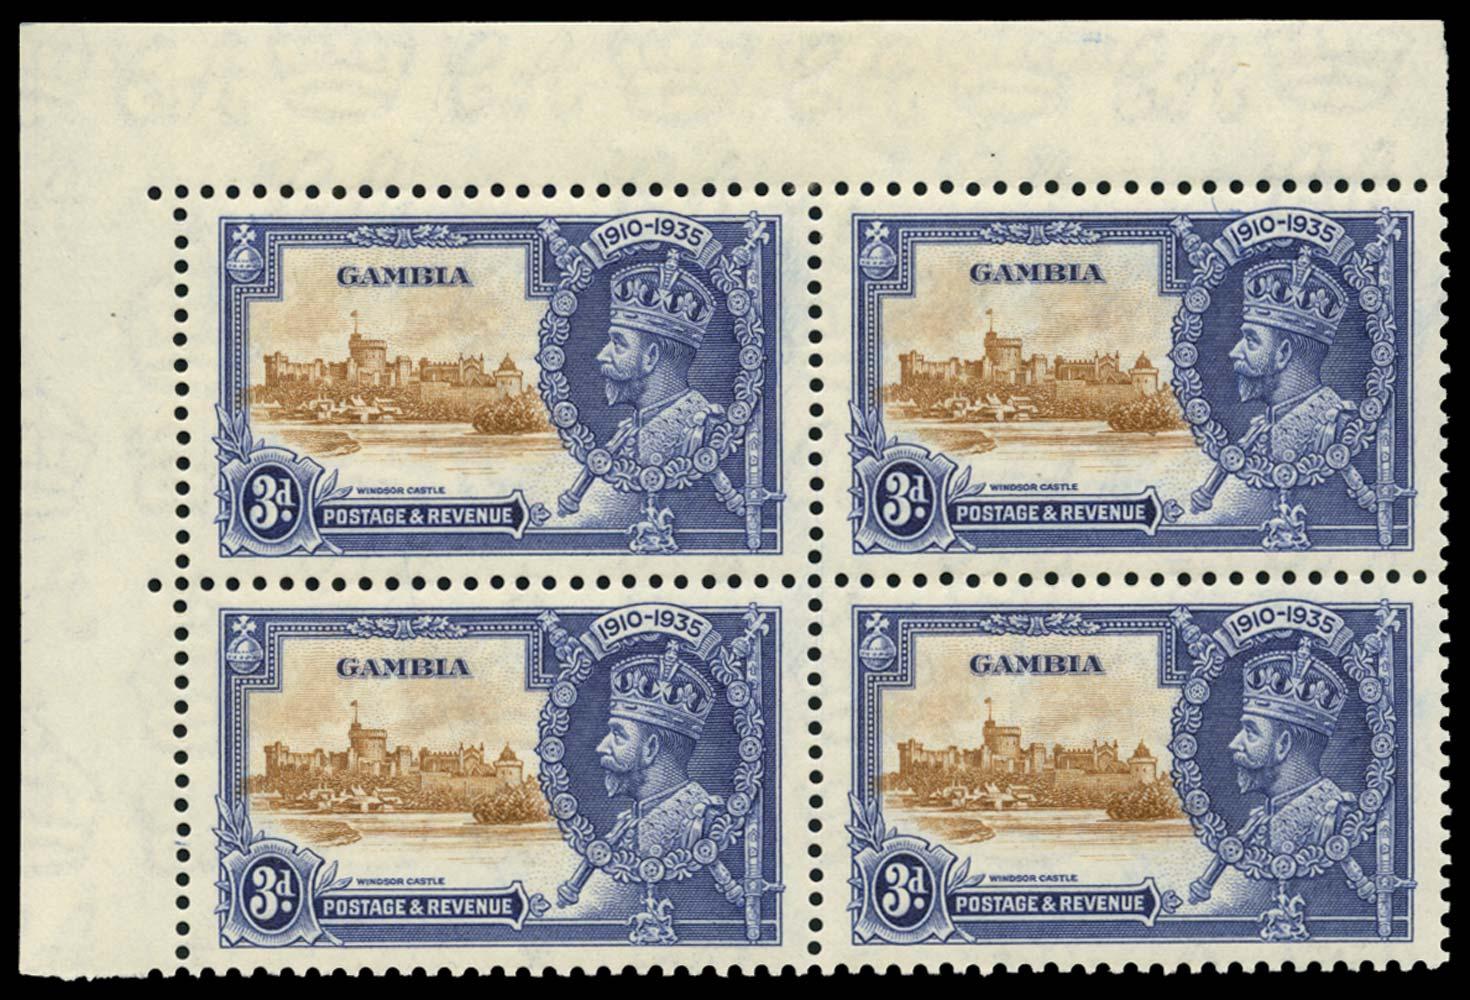 GAMBIA 1935  SG144/b Mint